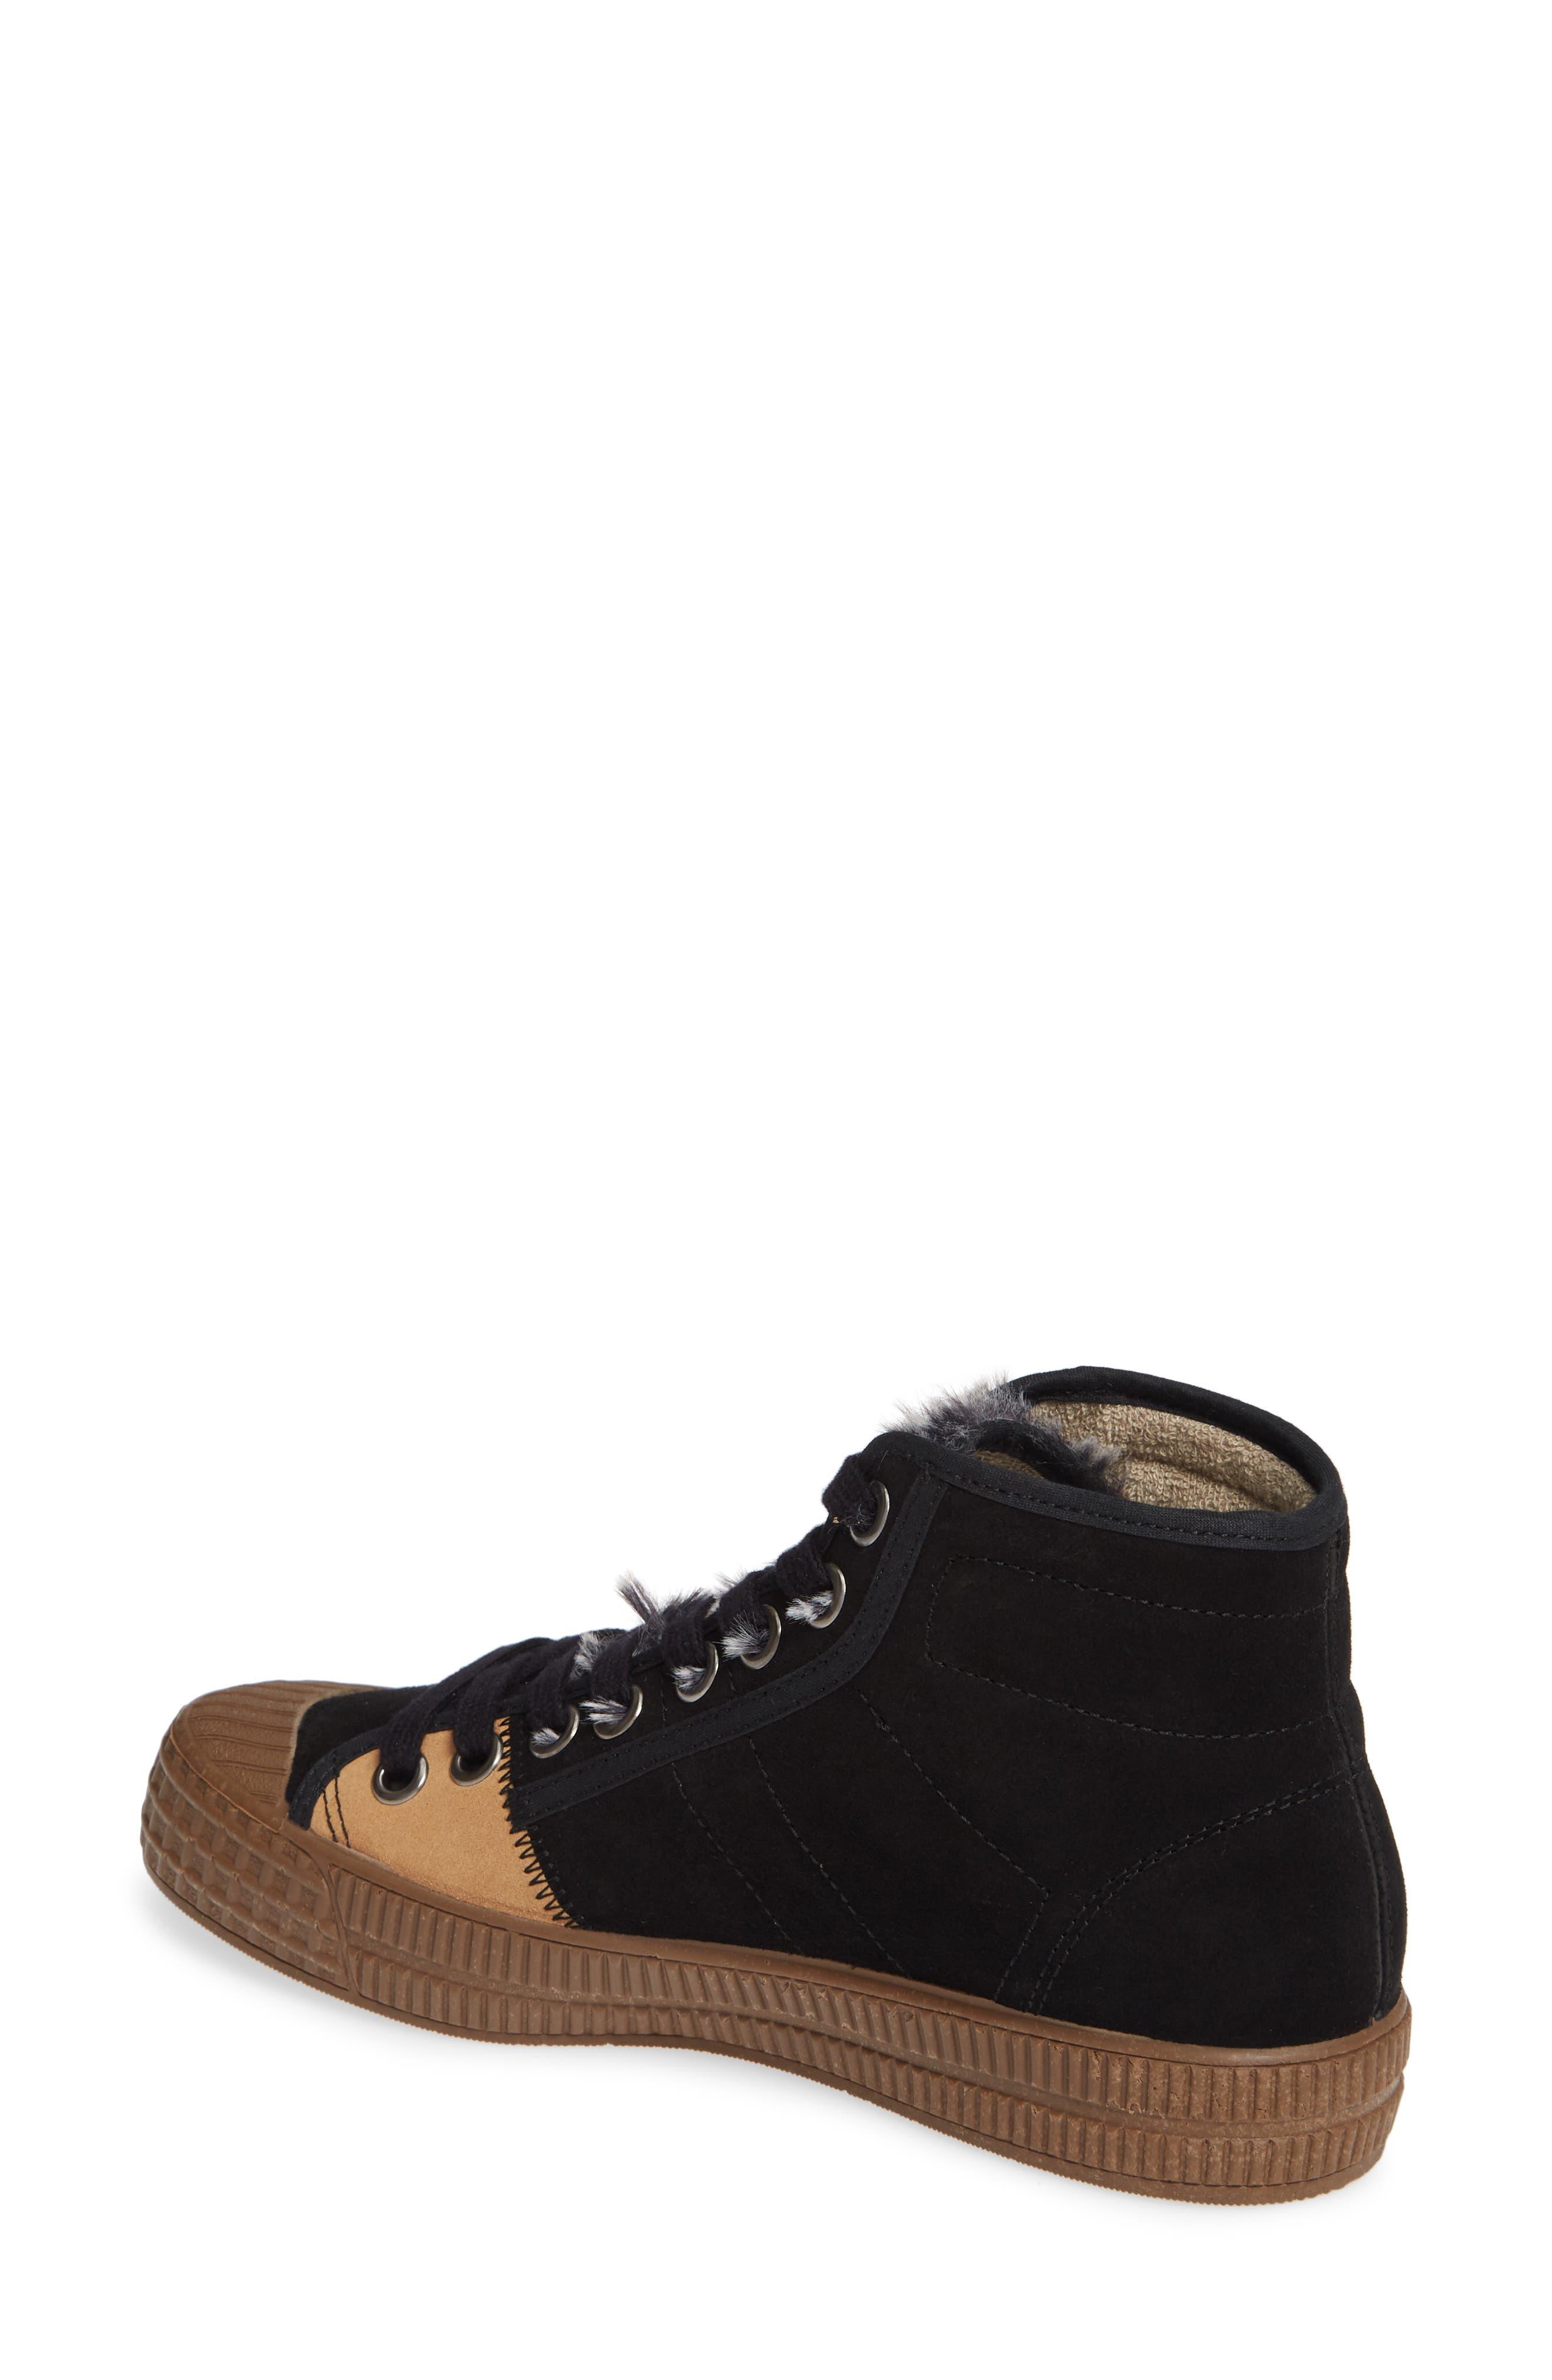 Femp High Top Sneaker,                             Alternate thumbnail 2, color,                             BLACK/ CAMEL SUEDE